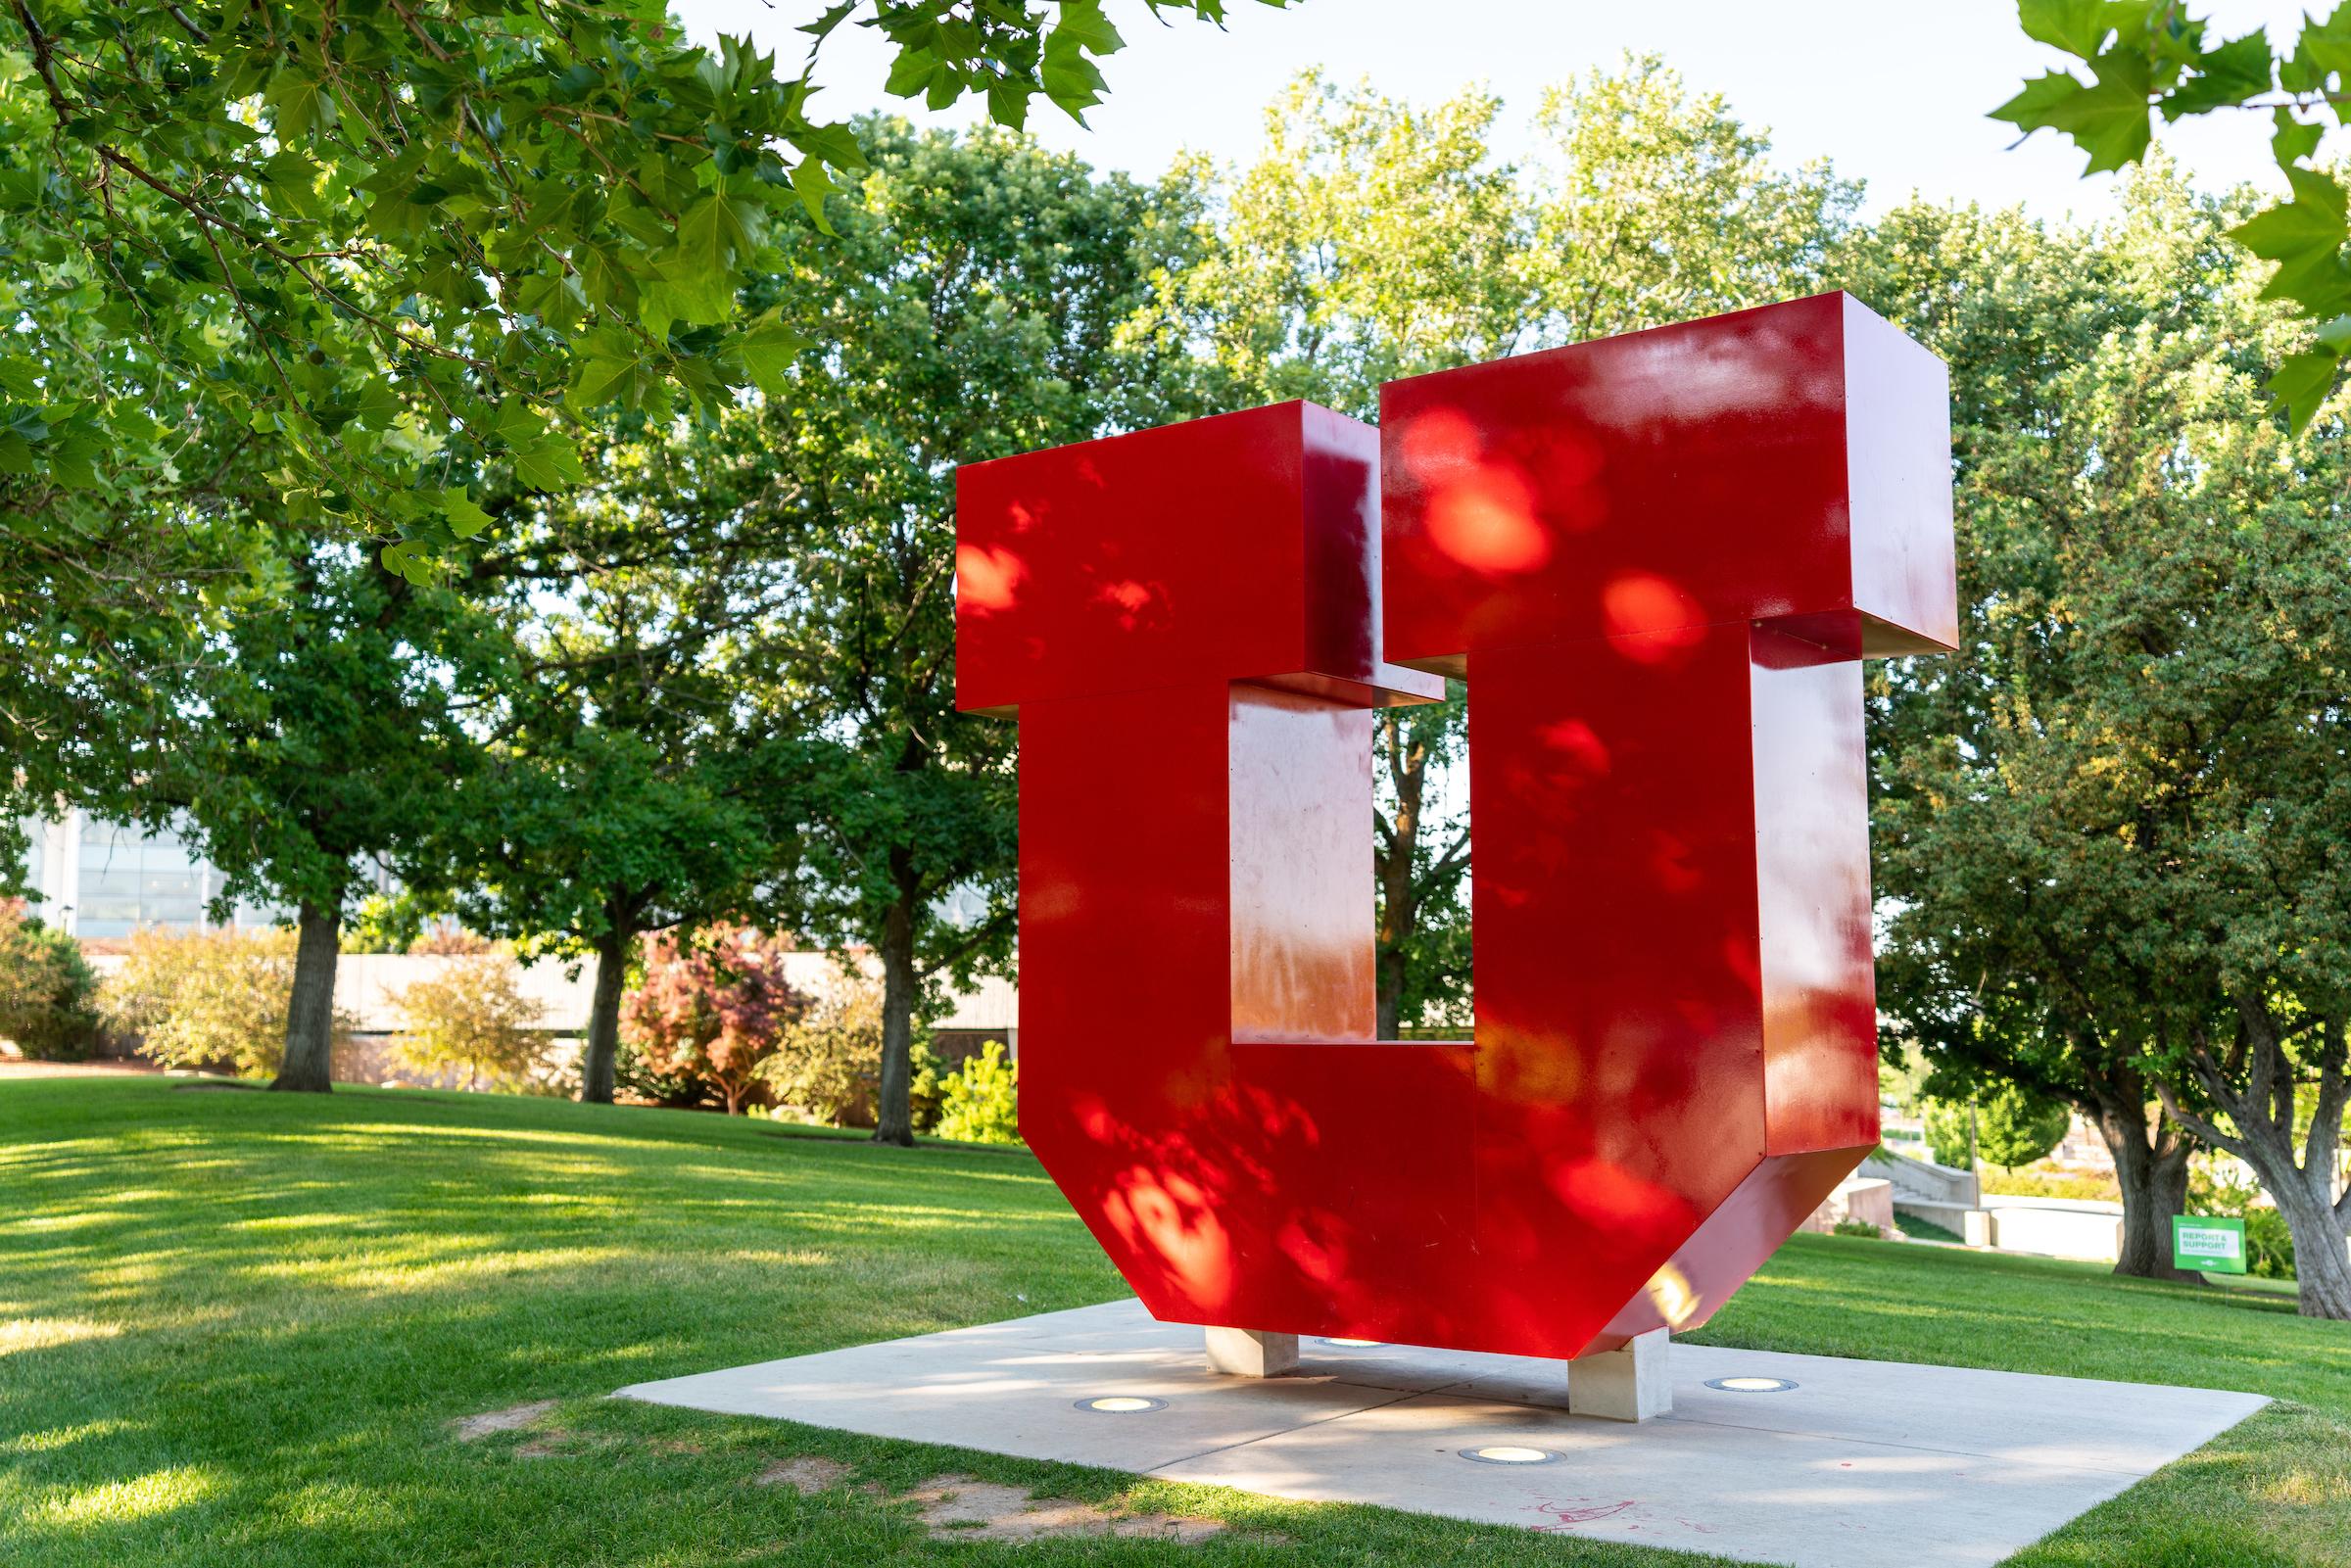 the Block U installation on the University of Utah campus